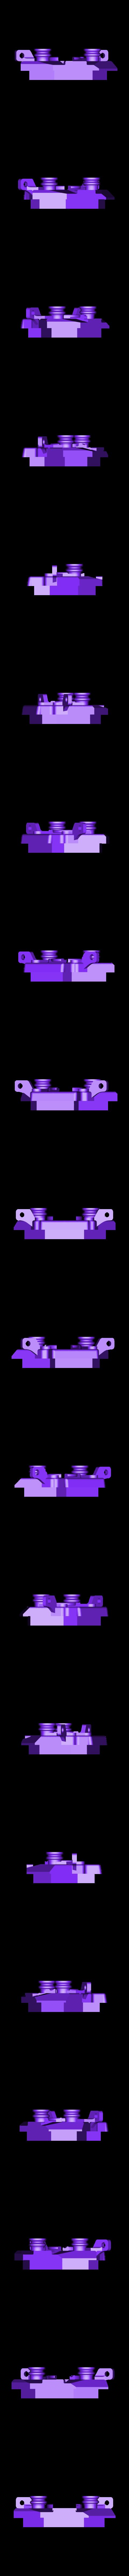 spu34servomountmotor.stl Download STL file 34' Ford Pickup Hot Rod • 3D printing object, macone1